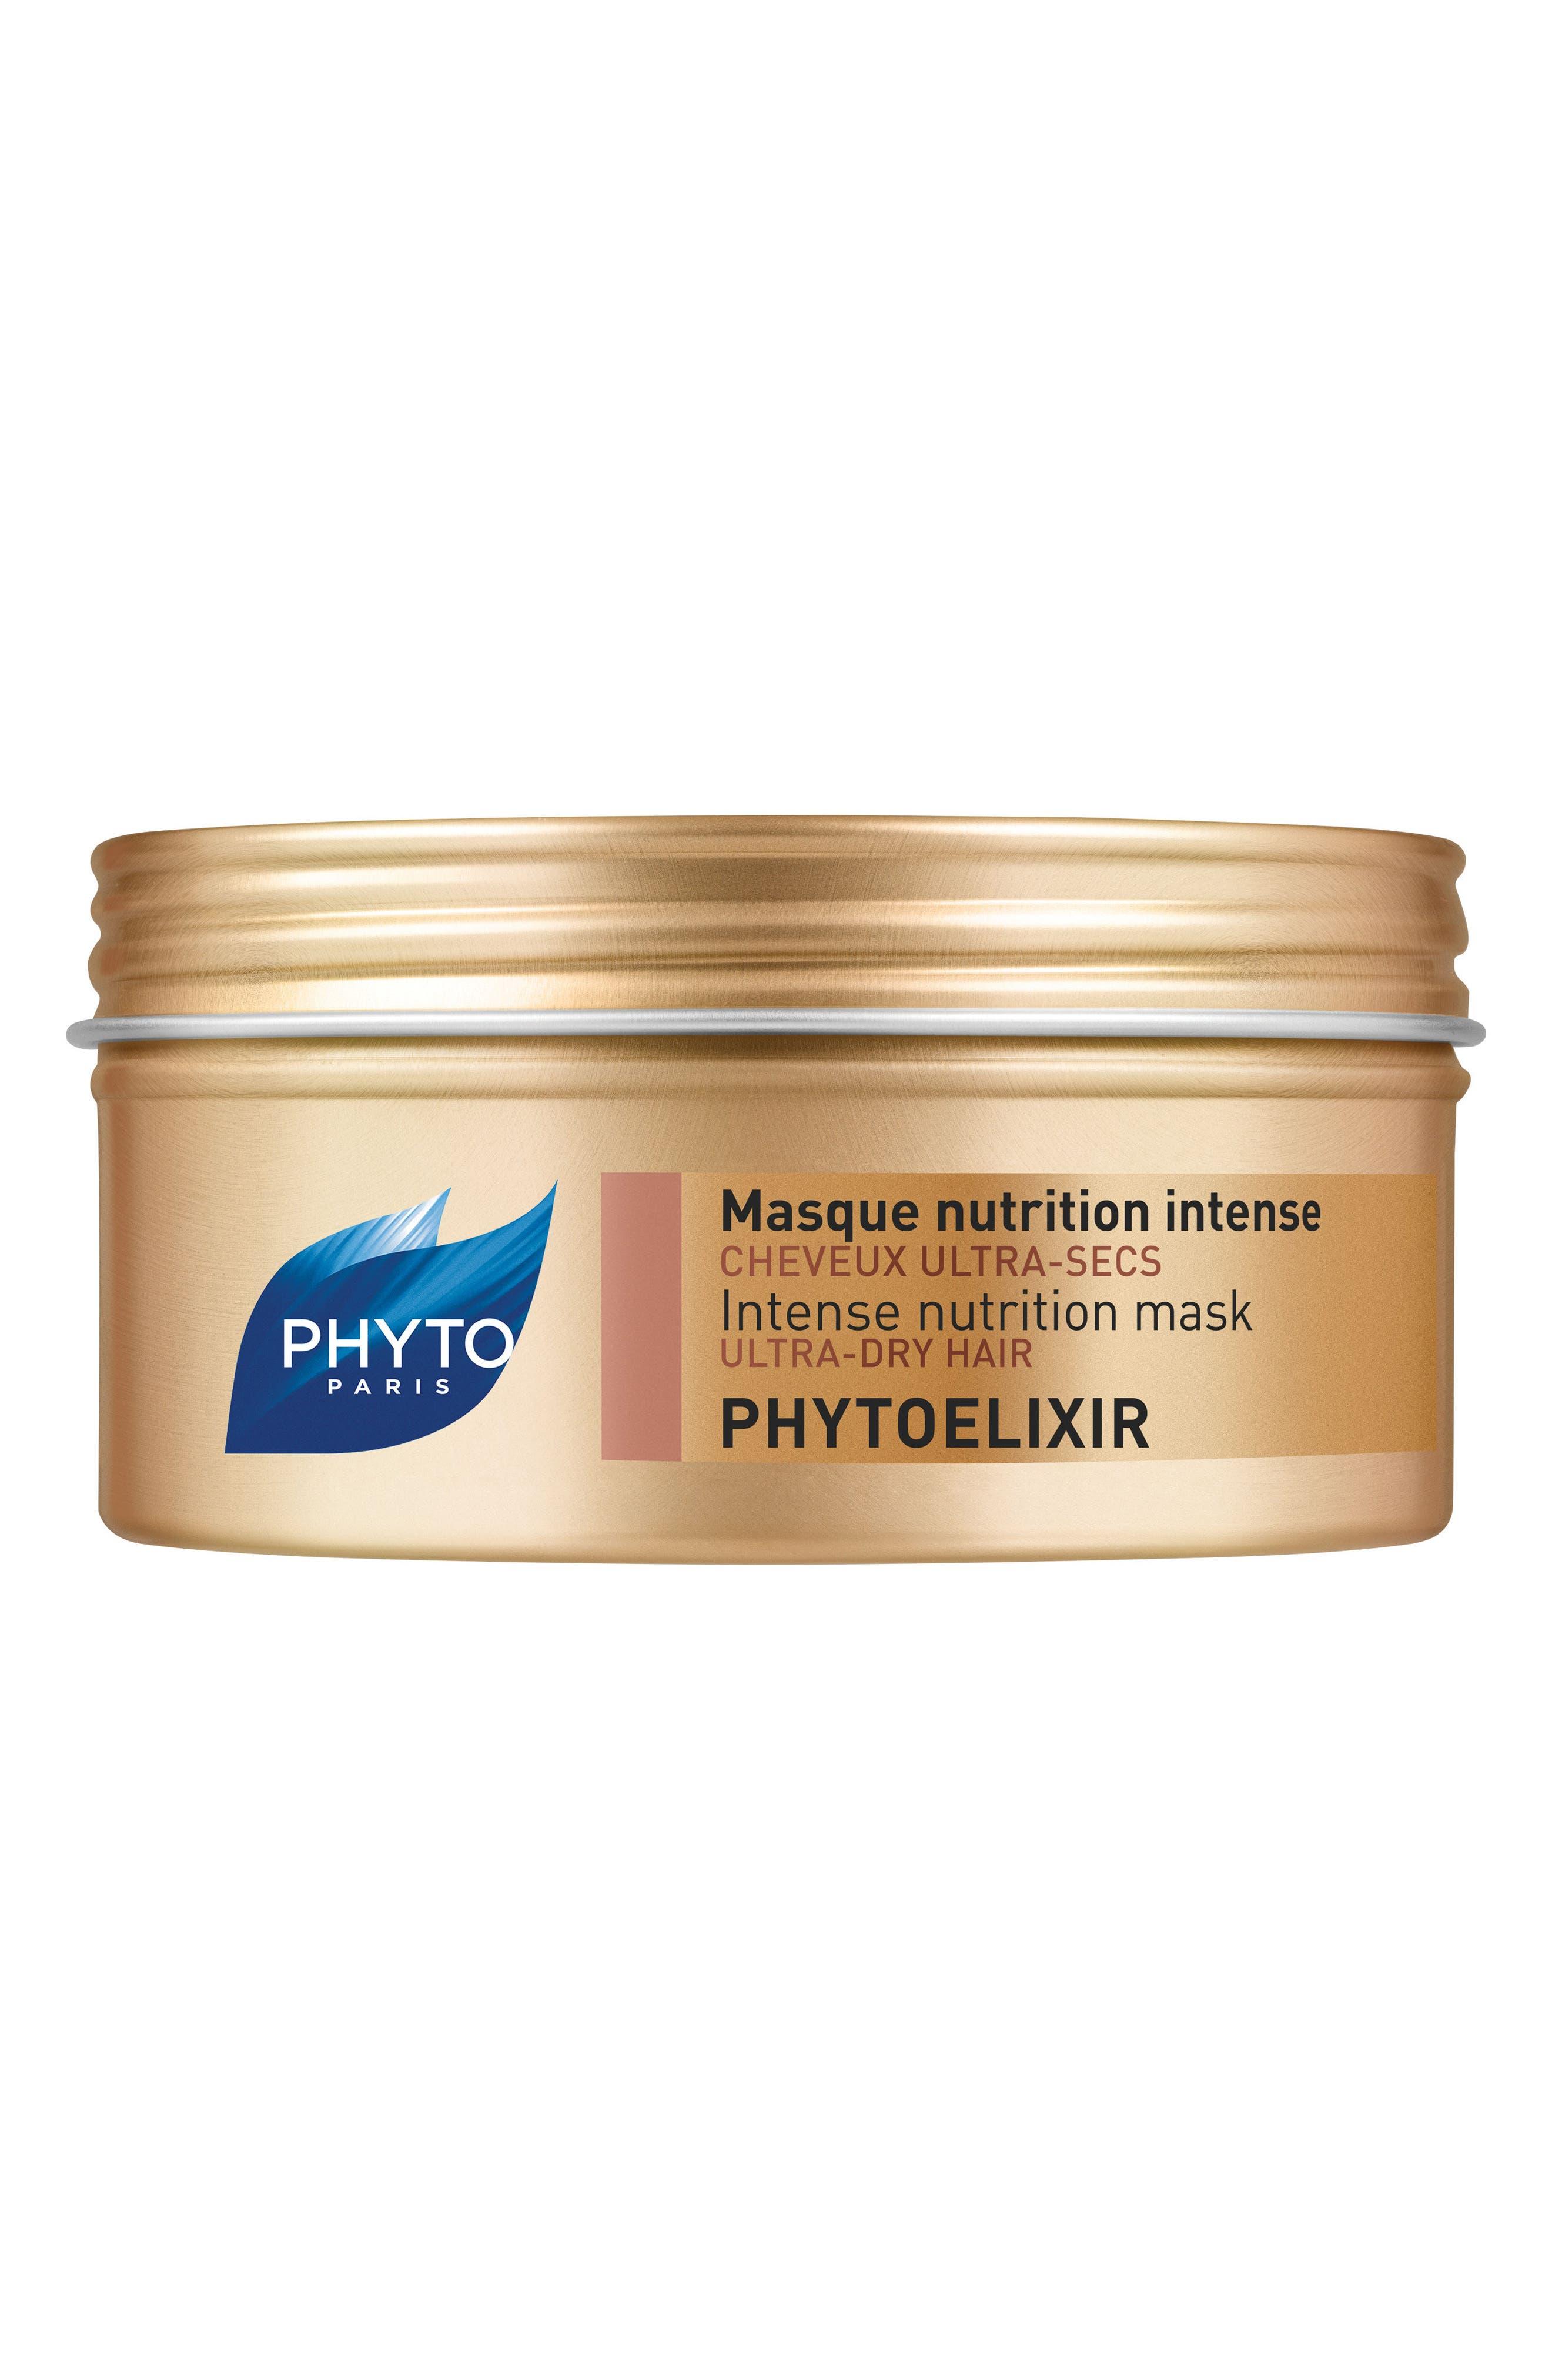 Phytoelixir Intense Nutrition Mask,                             Main thumbnail 1, color,                             No Color